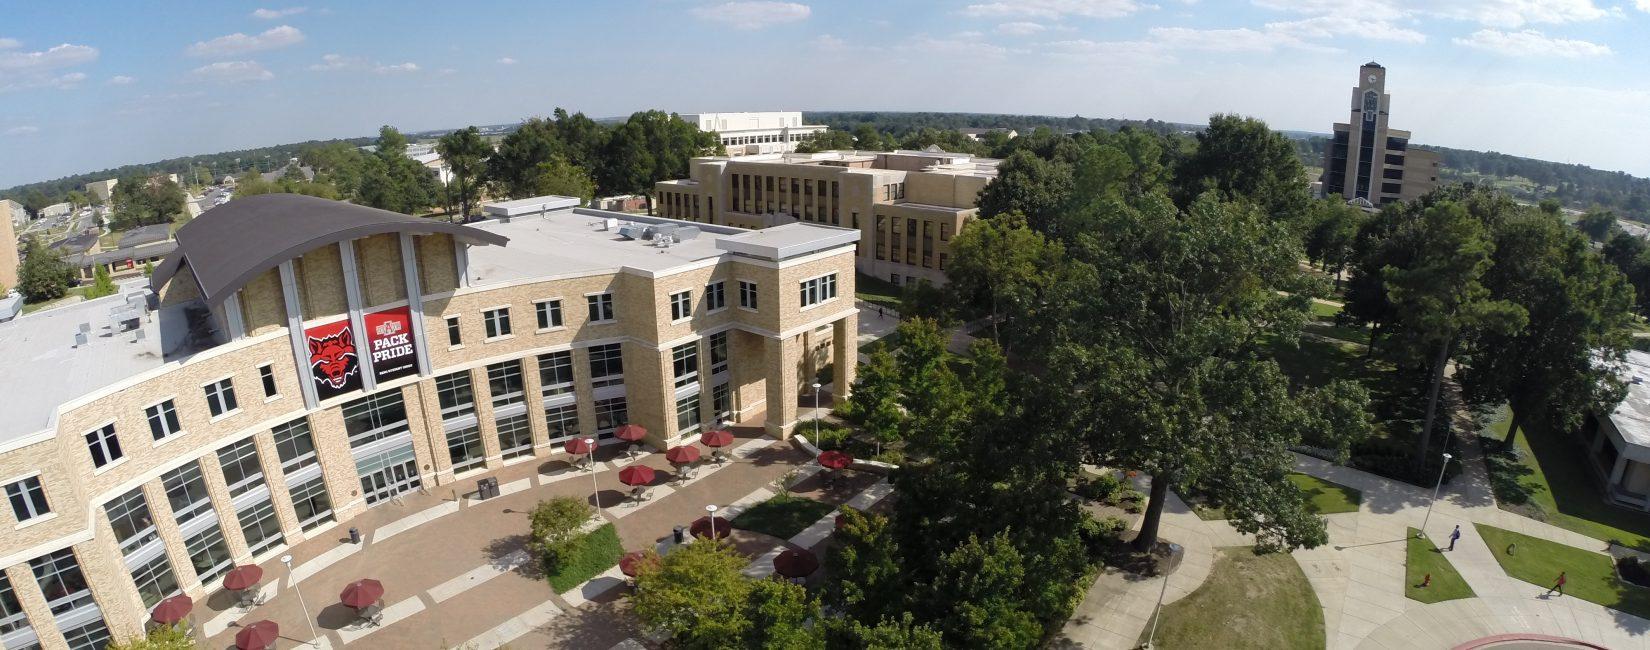 Arkansas State University aerial campus shot.